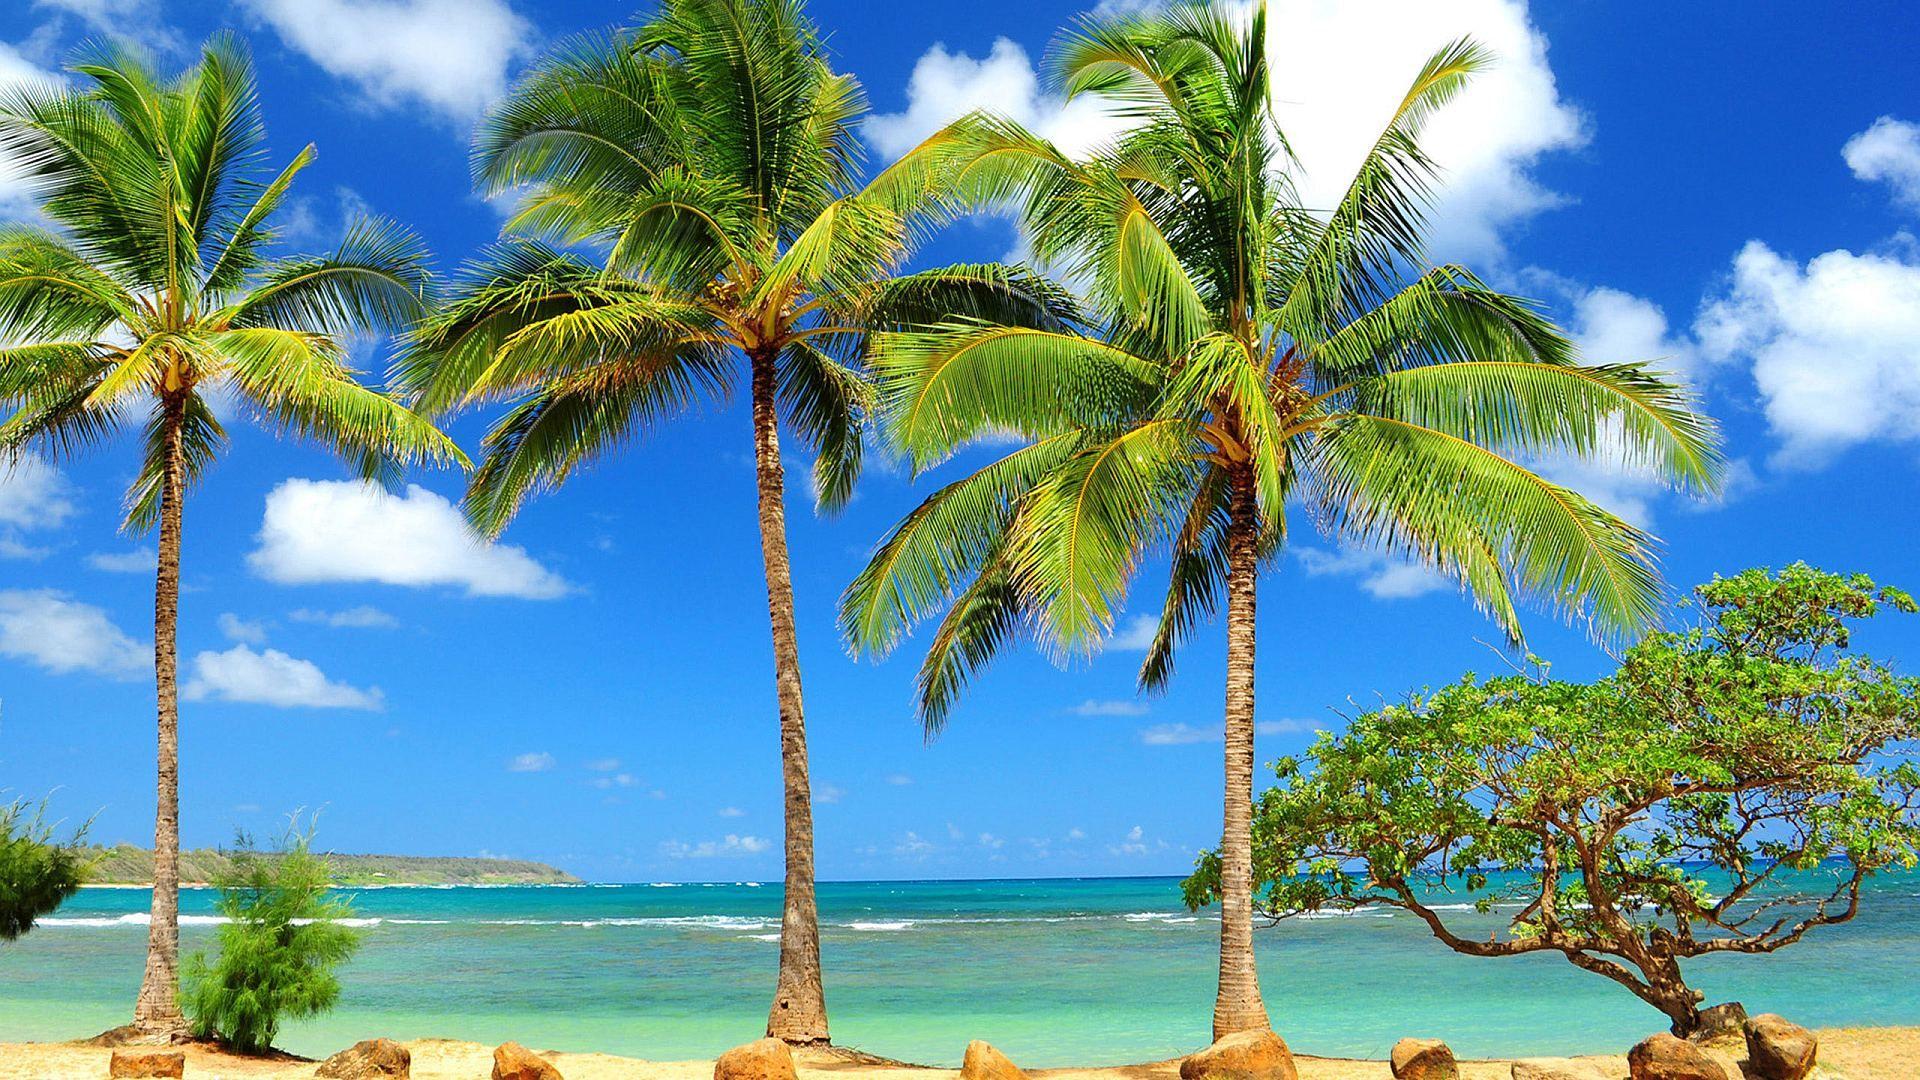 Aloha Picture